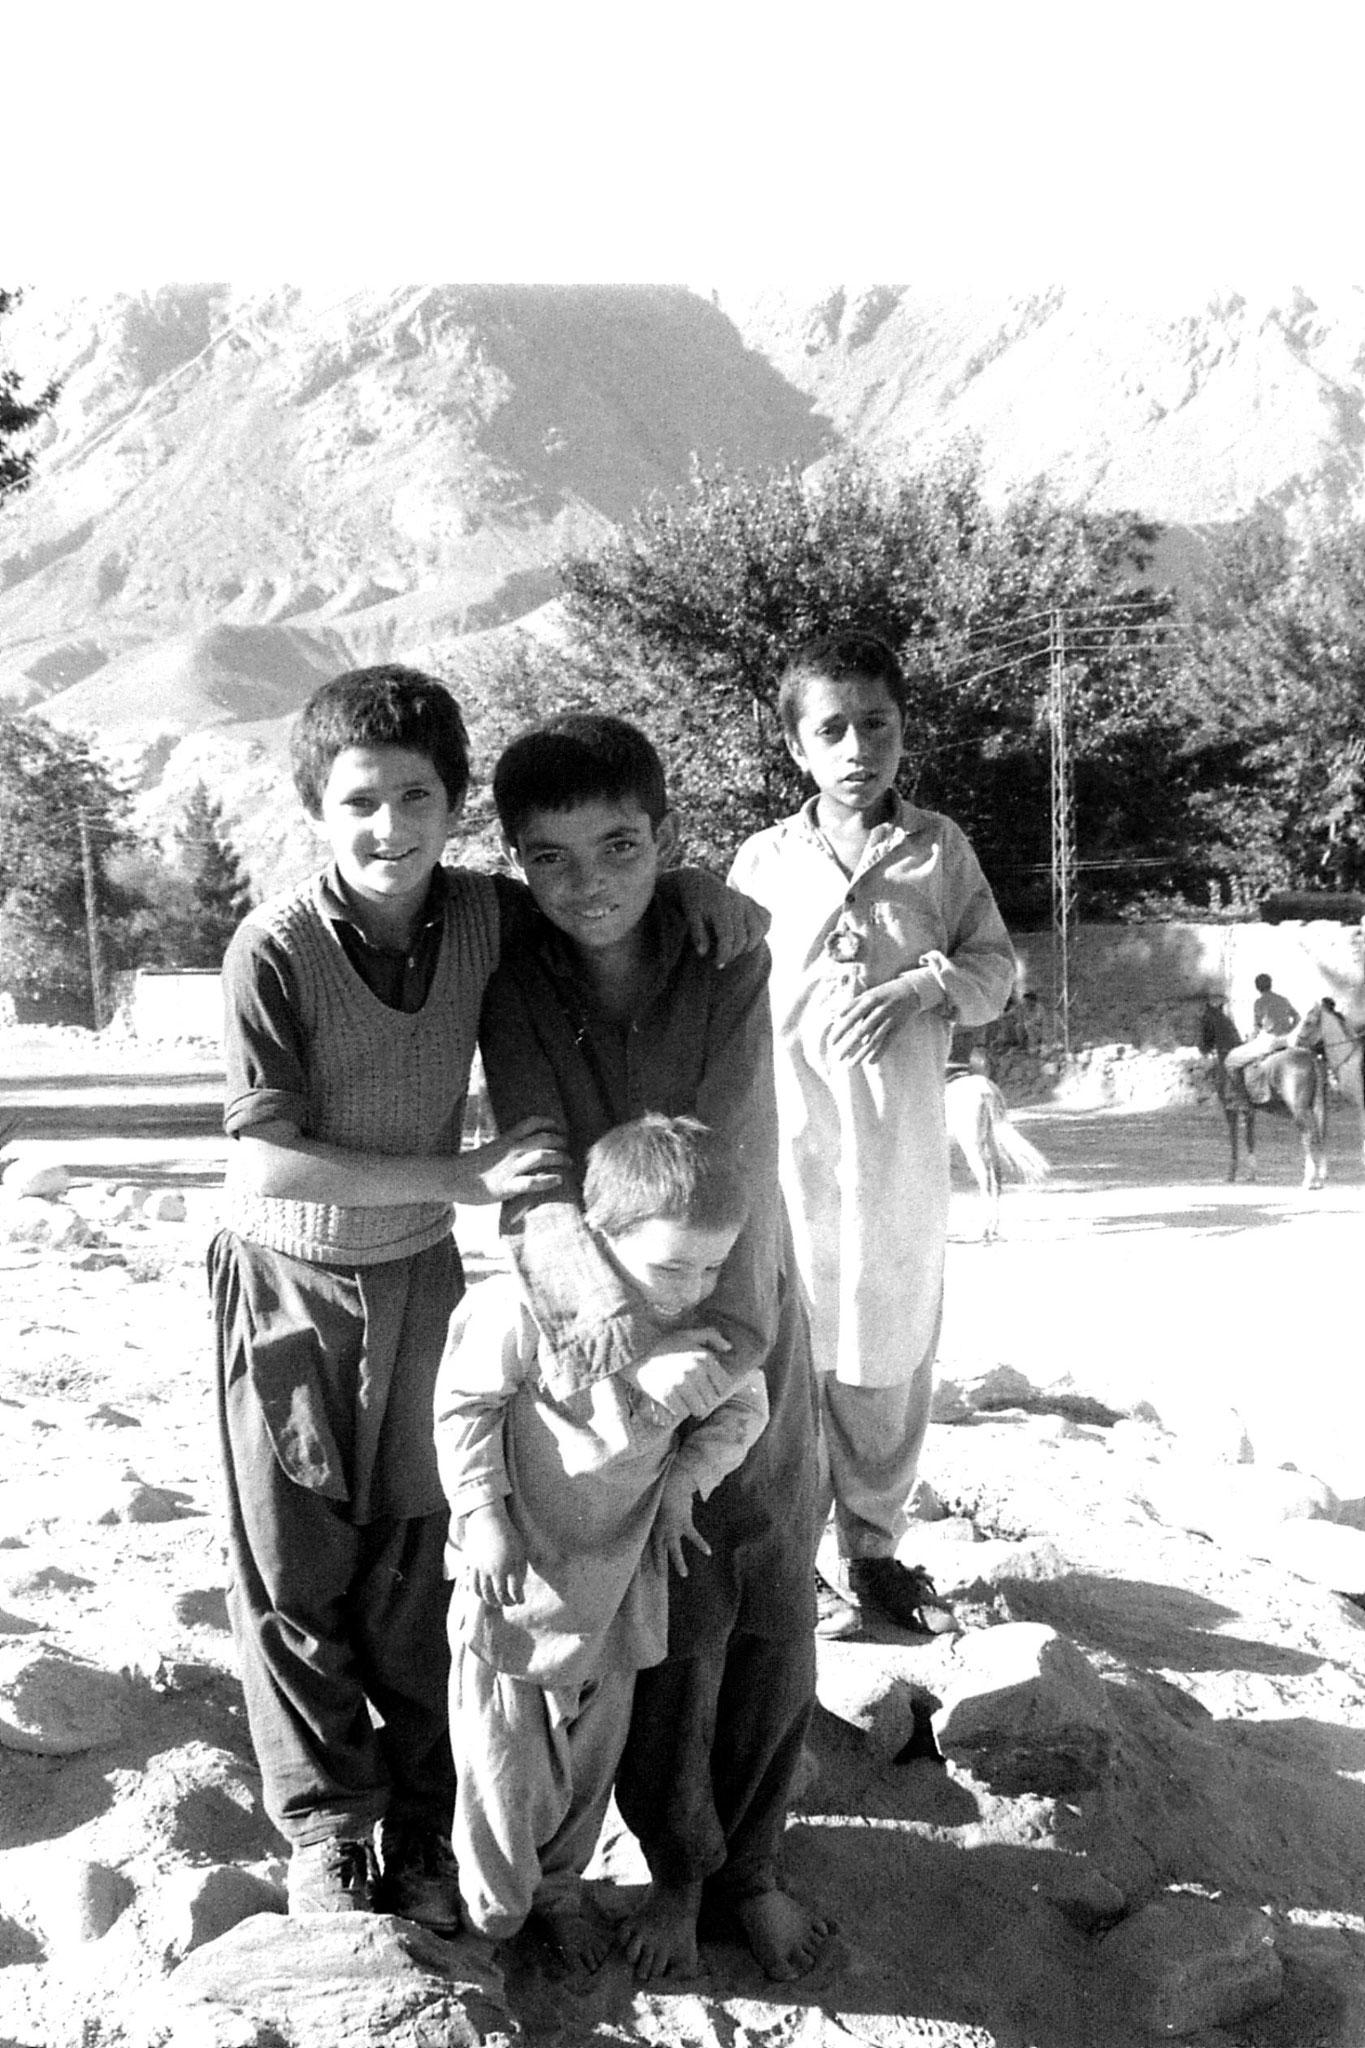 9/10/1989: 0: Gilgit polo match